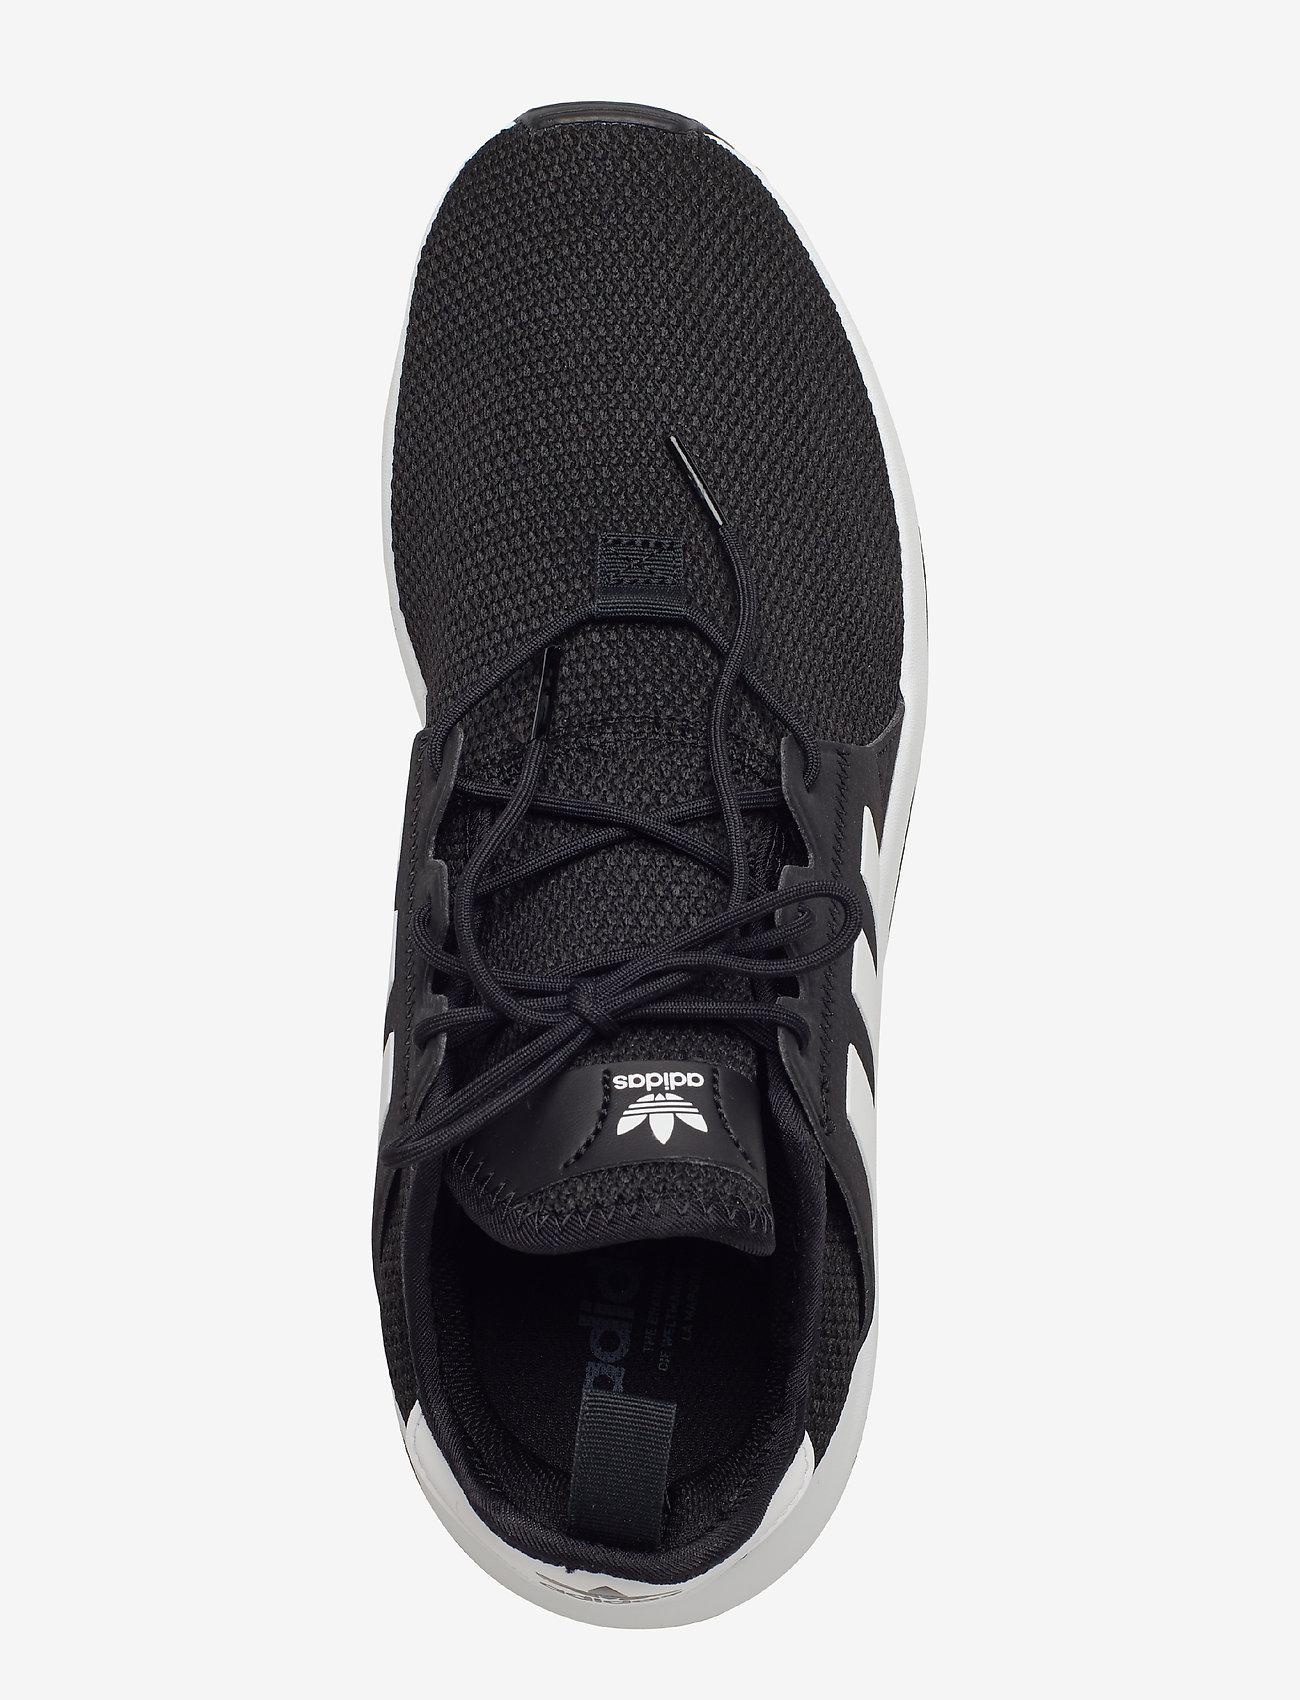 X_plr (Cblack/ftwwht/cblack) - adidas Originals